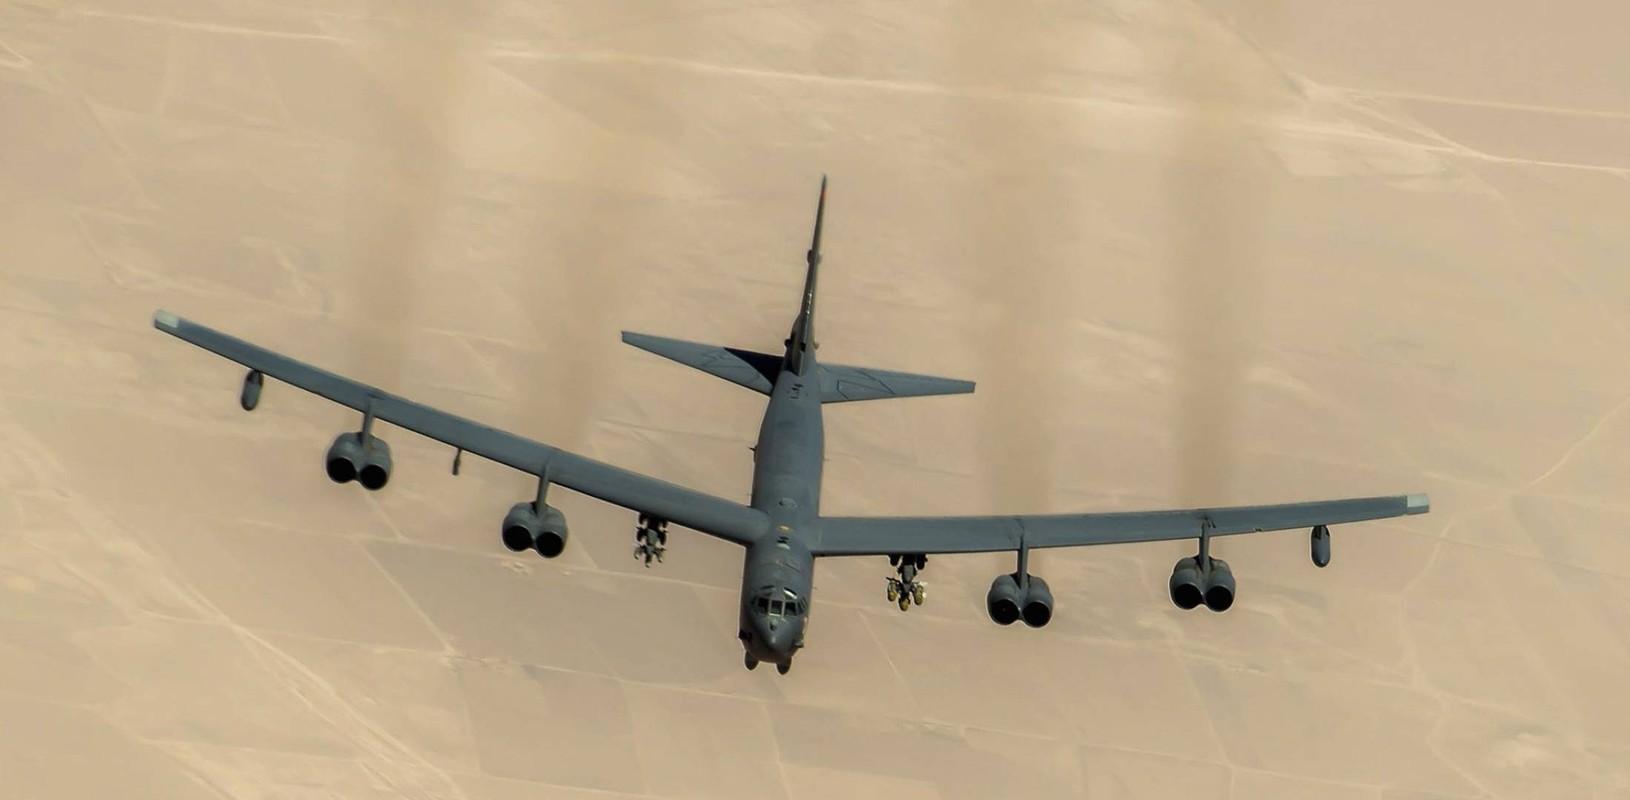 Phao dai bay B-52 My ap sat ban dao Crimea, Nga lo sot vo-Hinh-15